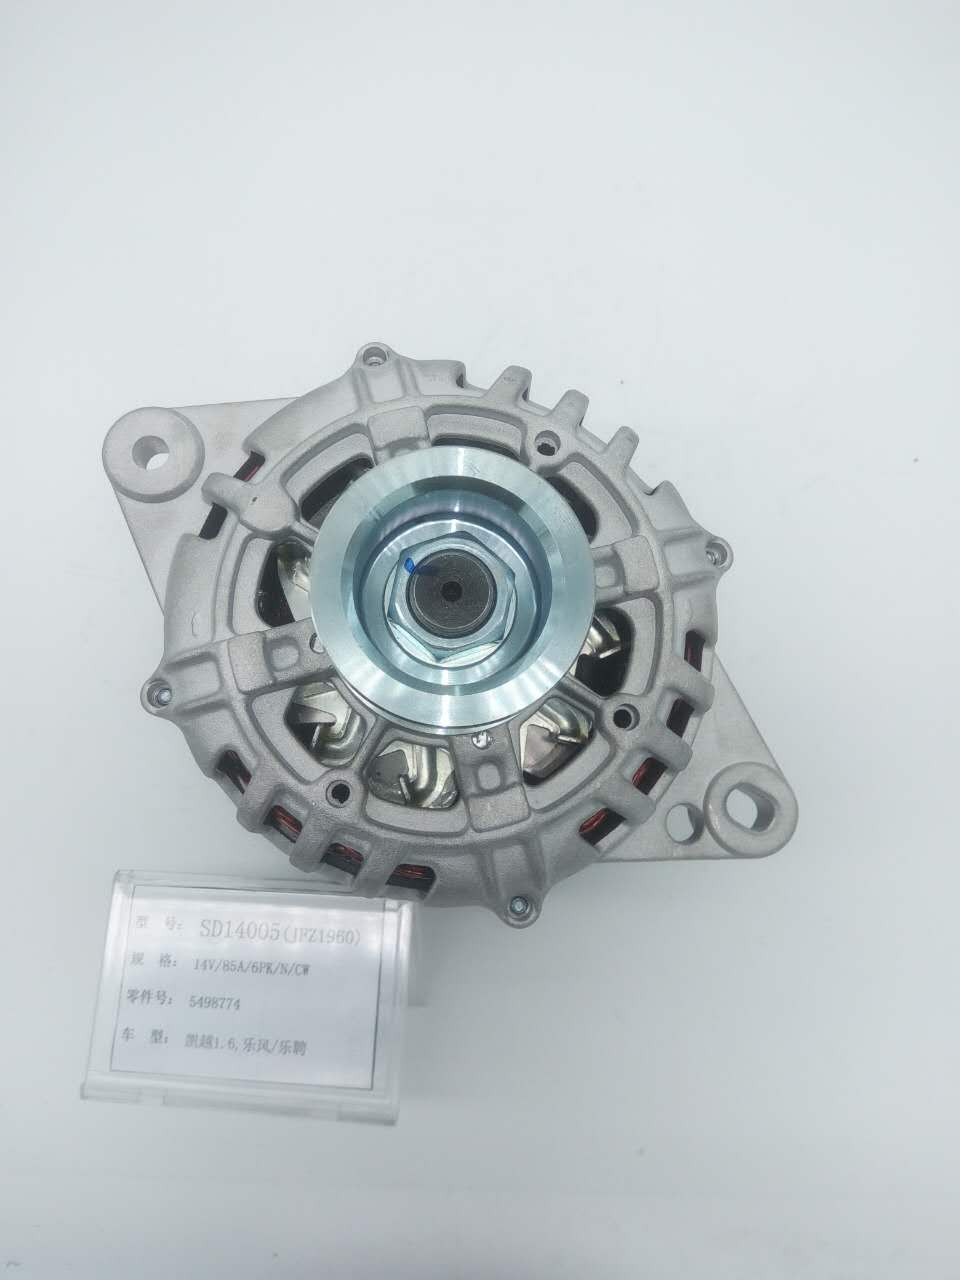 Buick alternator 5498774 96540542 SD14005